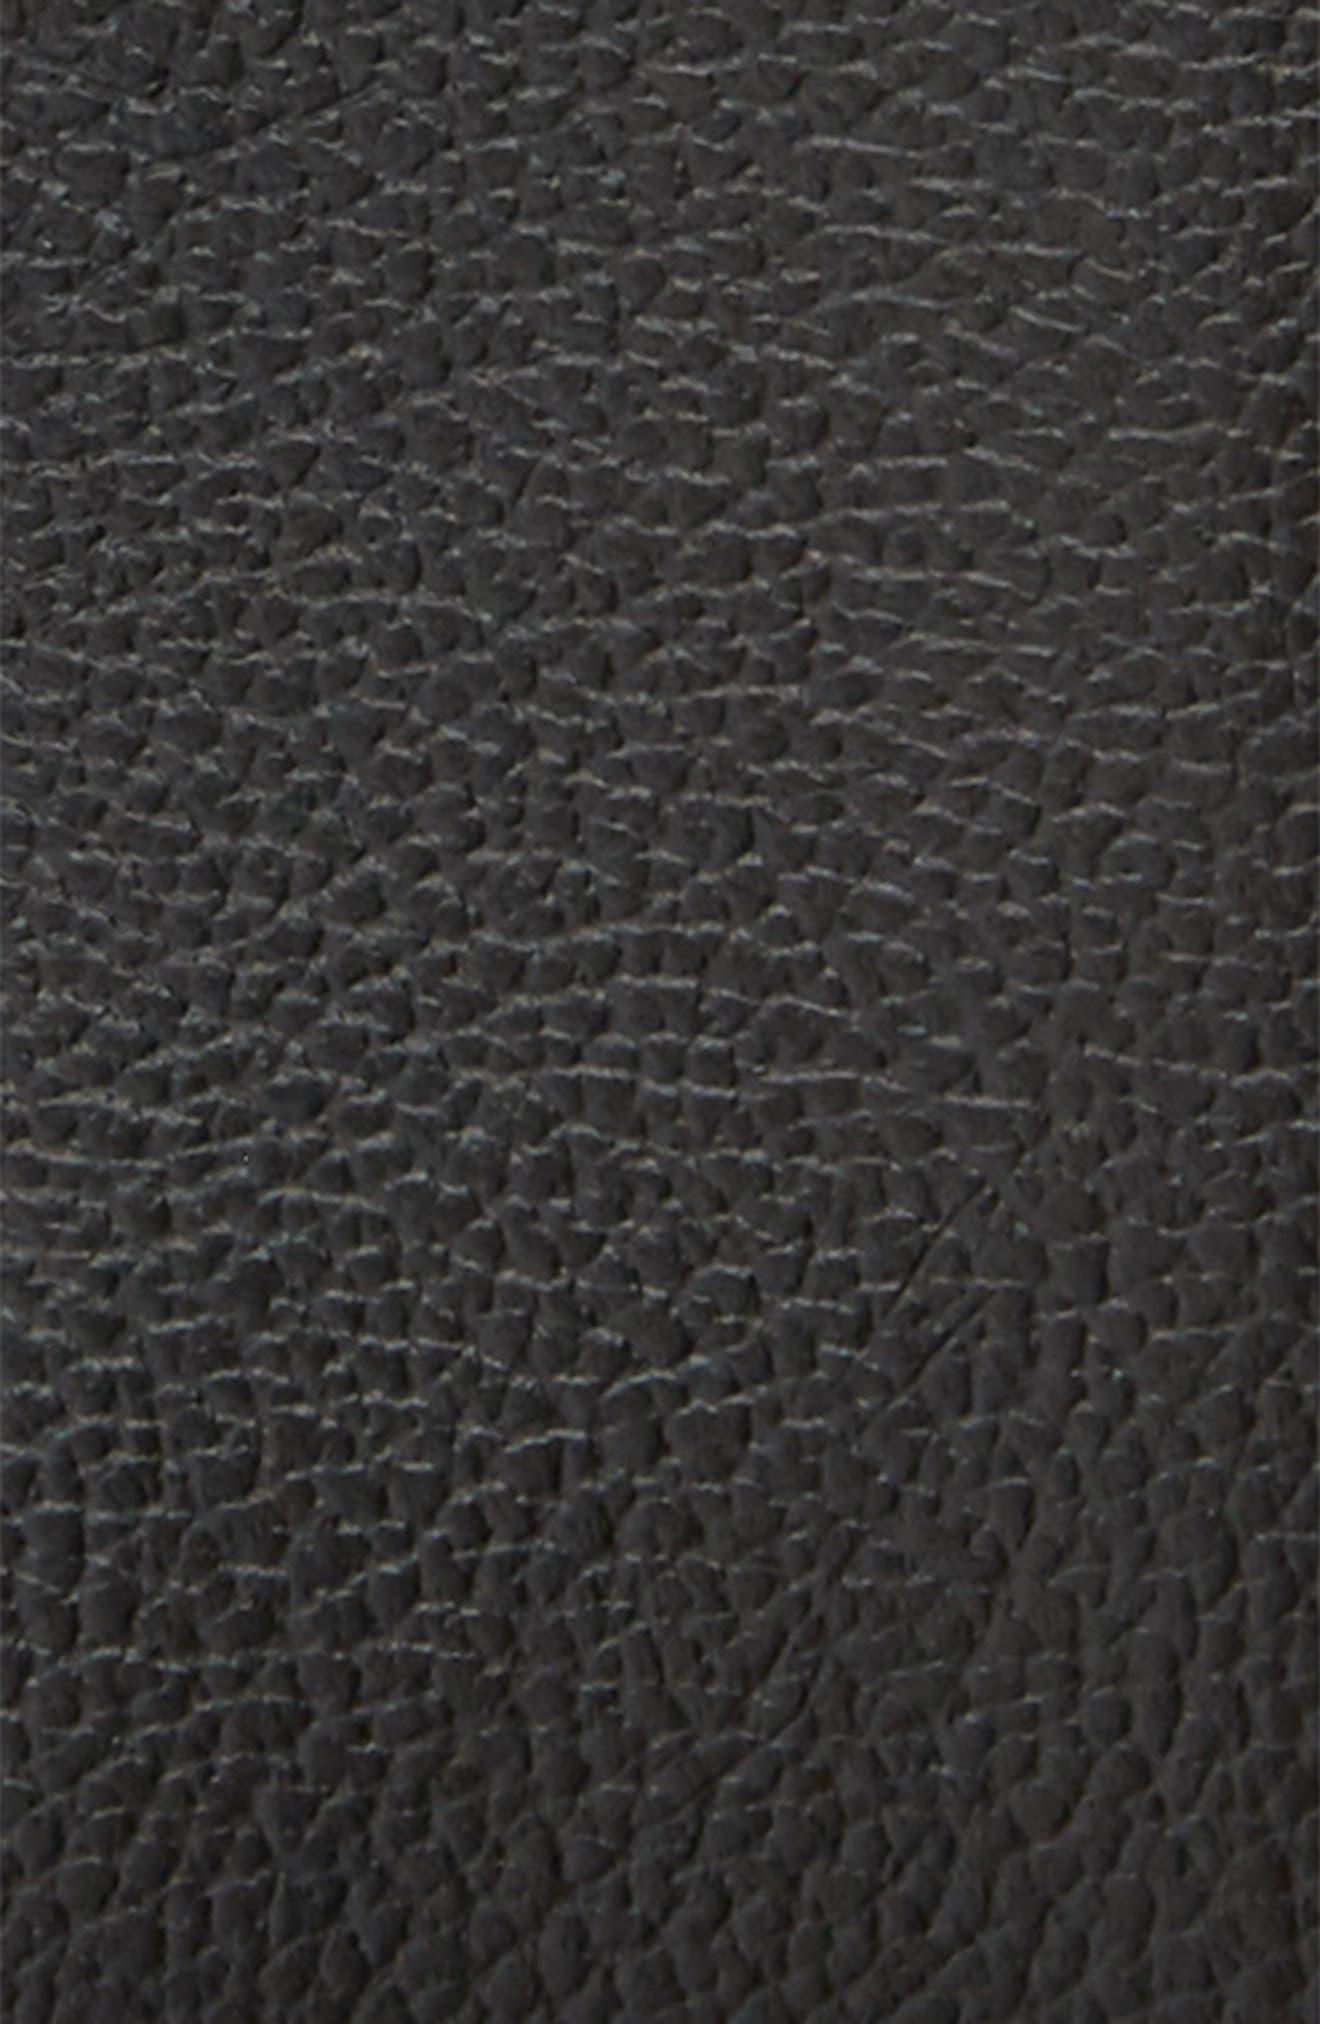 Bayview Ave. Leather Belt,                             Alternate thumbnail 2, color,                             Black